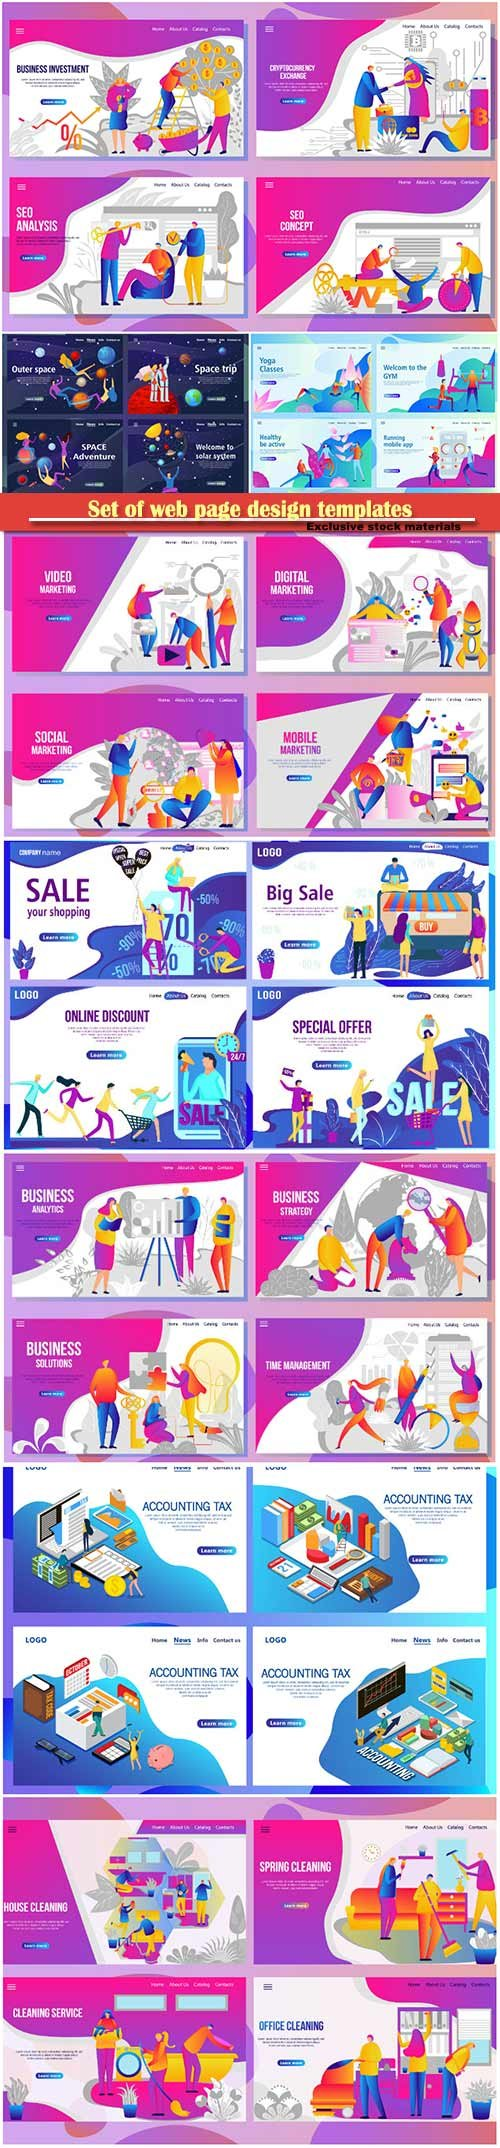 Set of web page design templates for business, vector illustration concepts for website